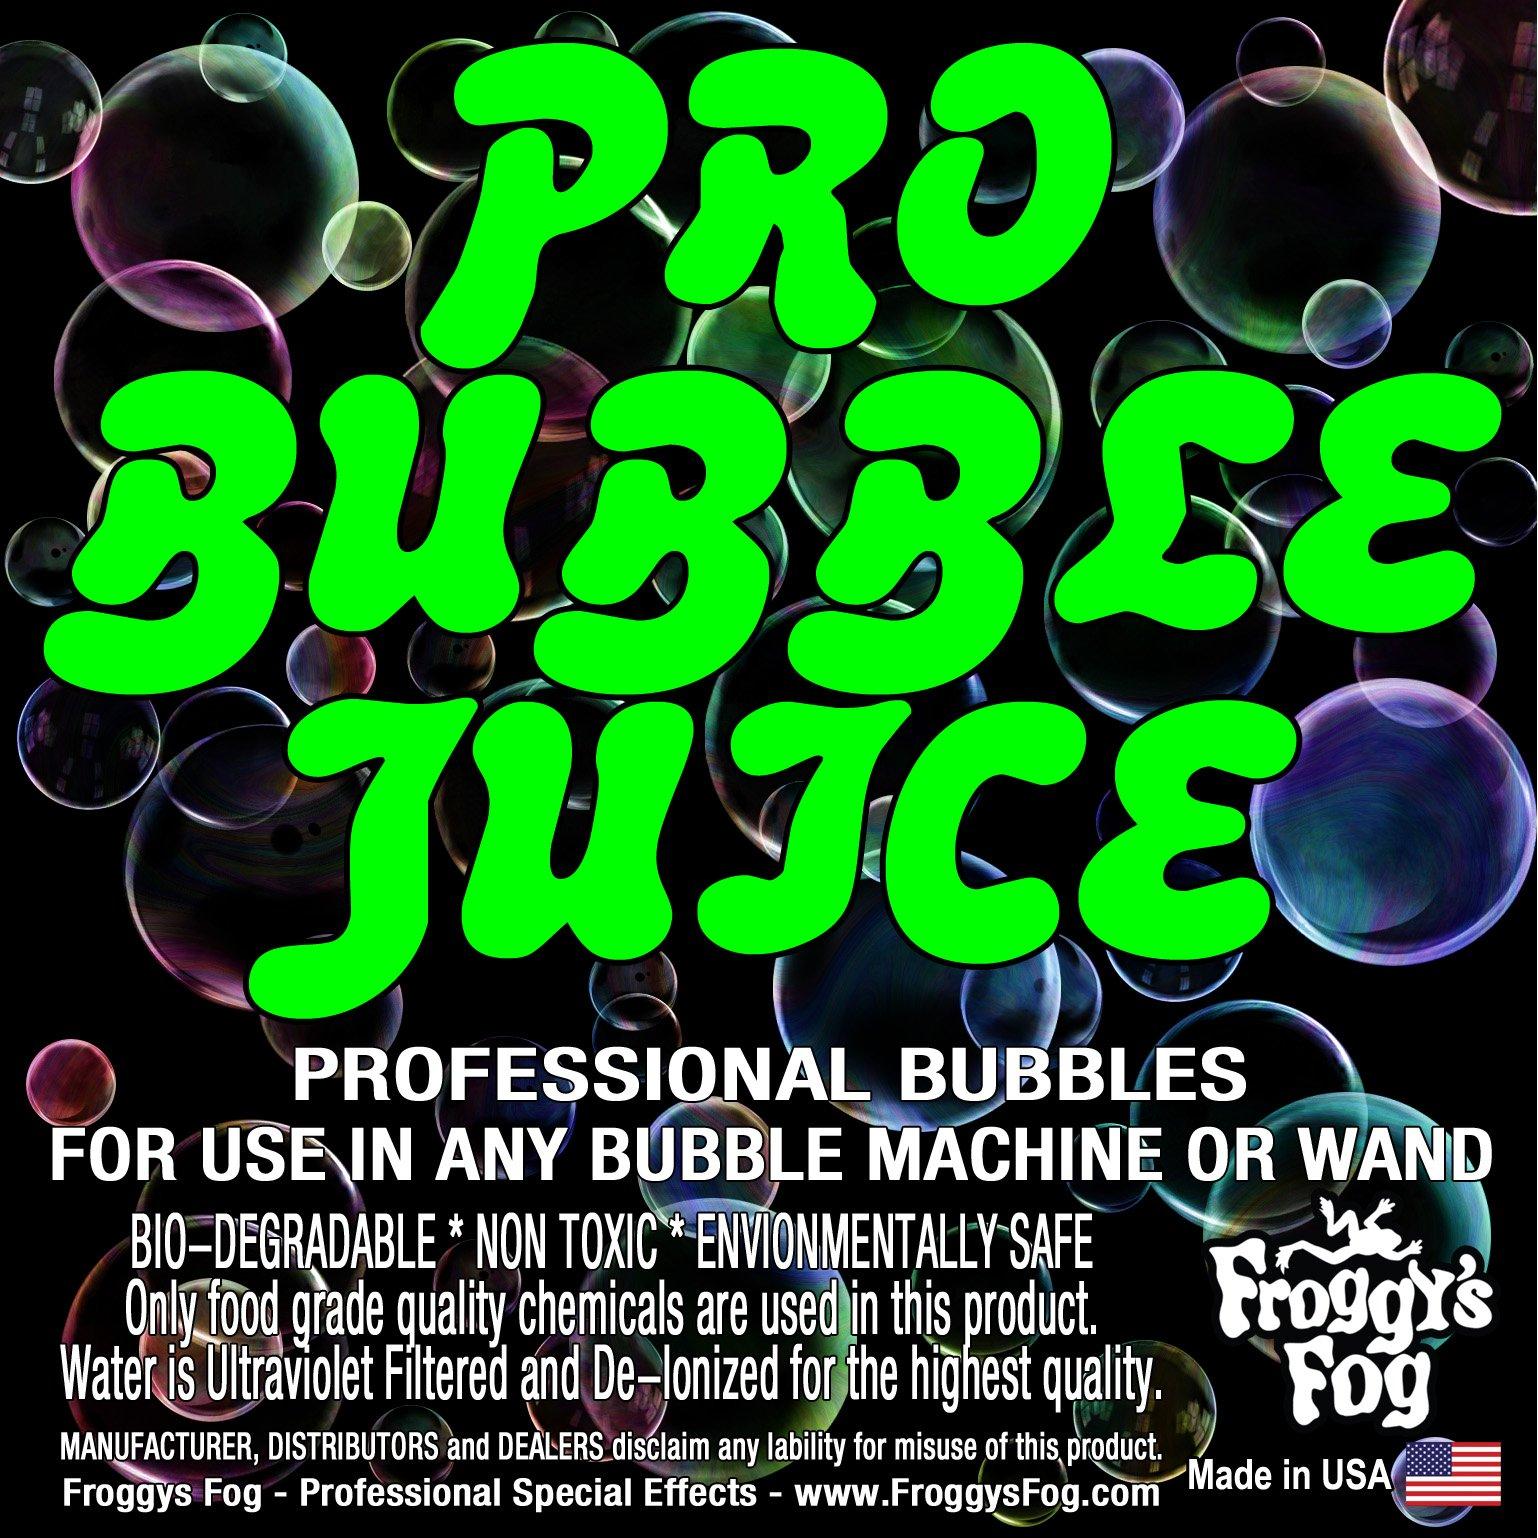 Froggys Fog - Pro Bubble Juice - Professional Bubble Fluid for All Bubble Machines and Bubblers - 55 Gallon Drum